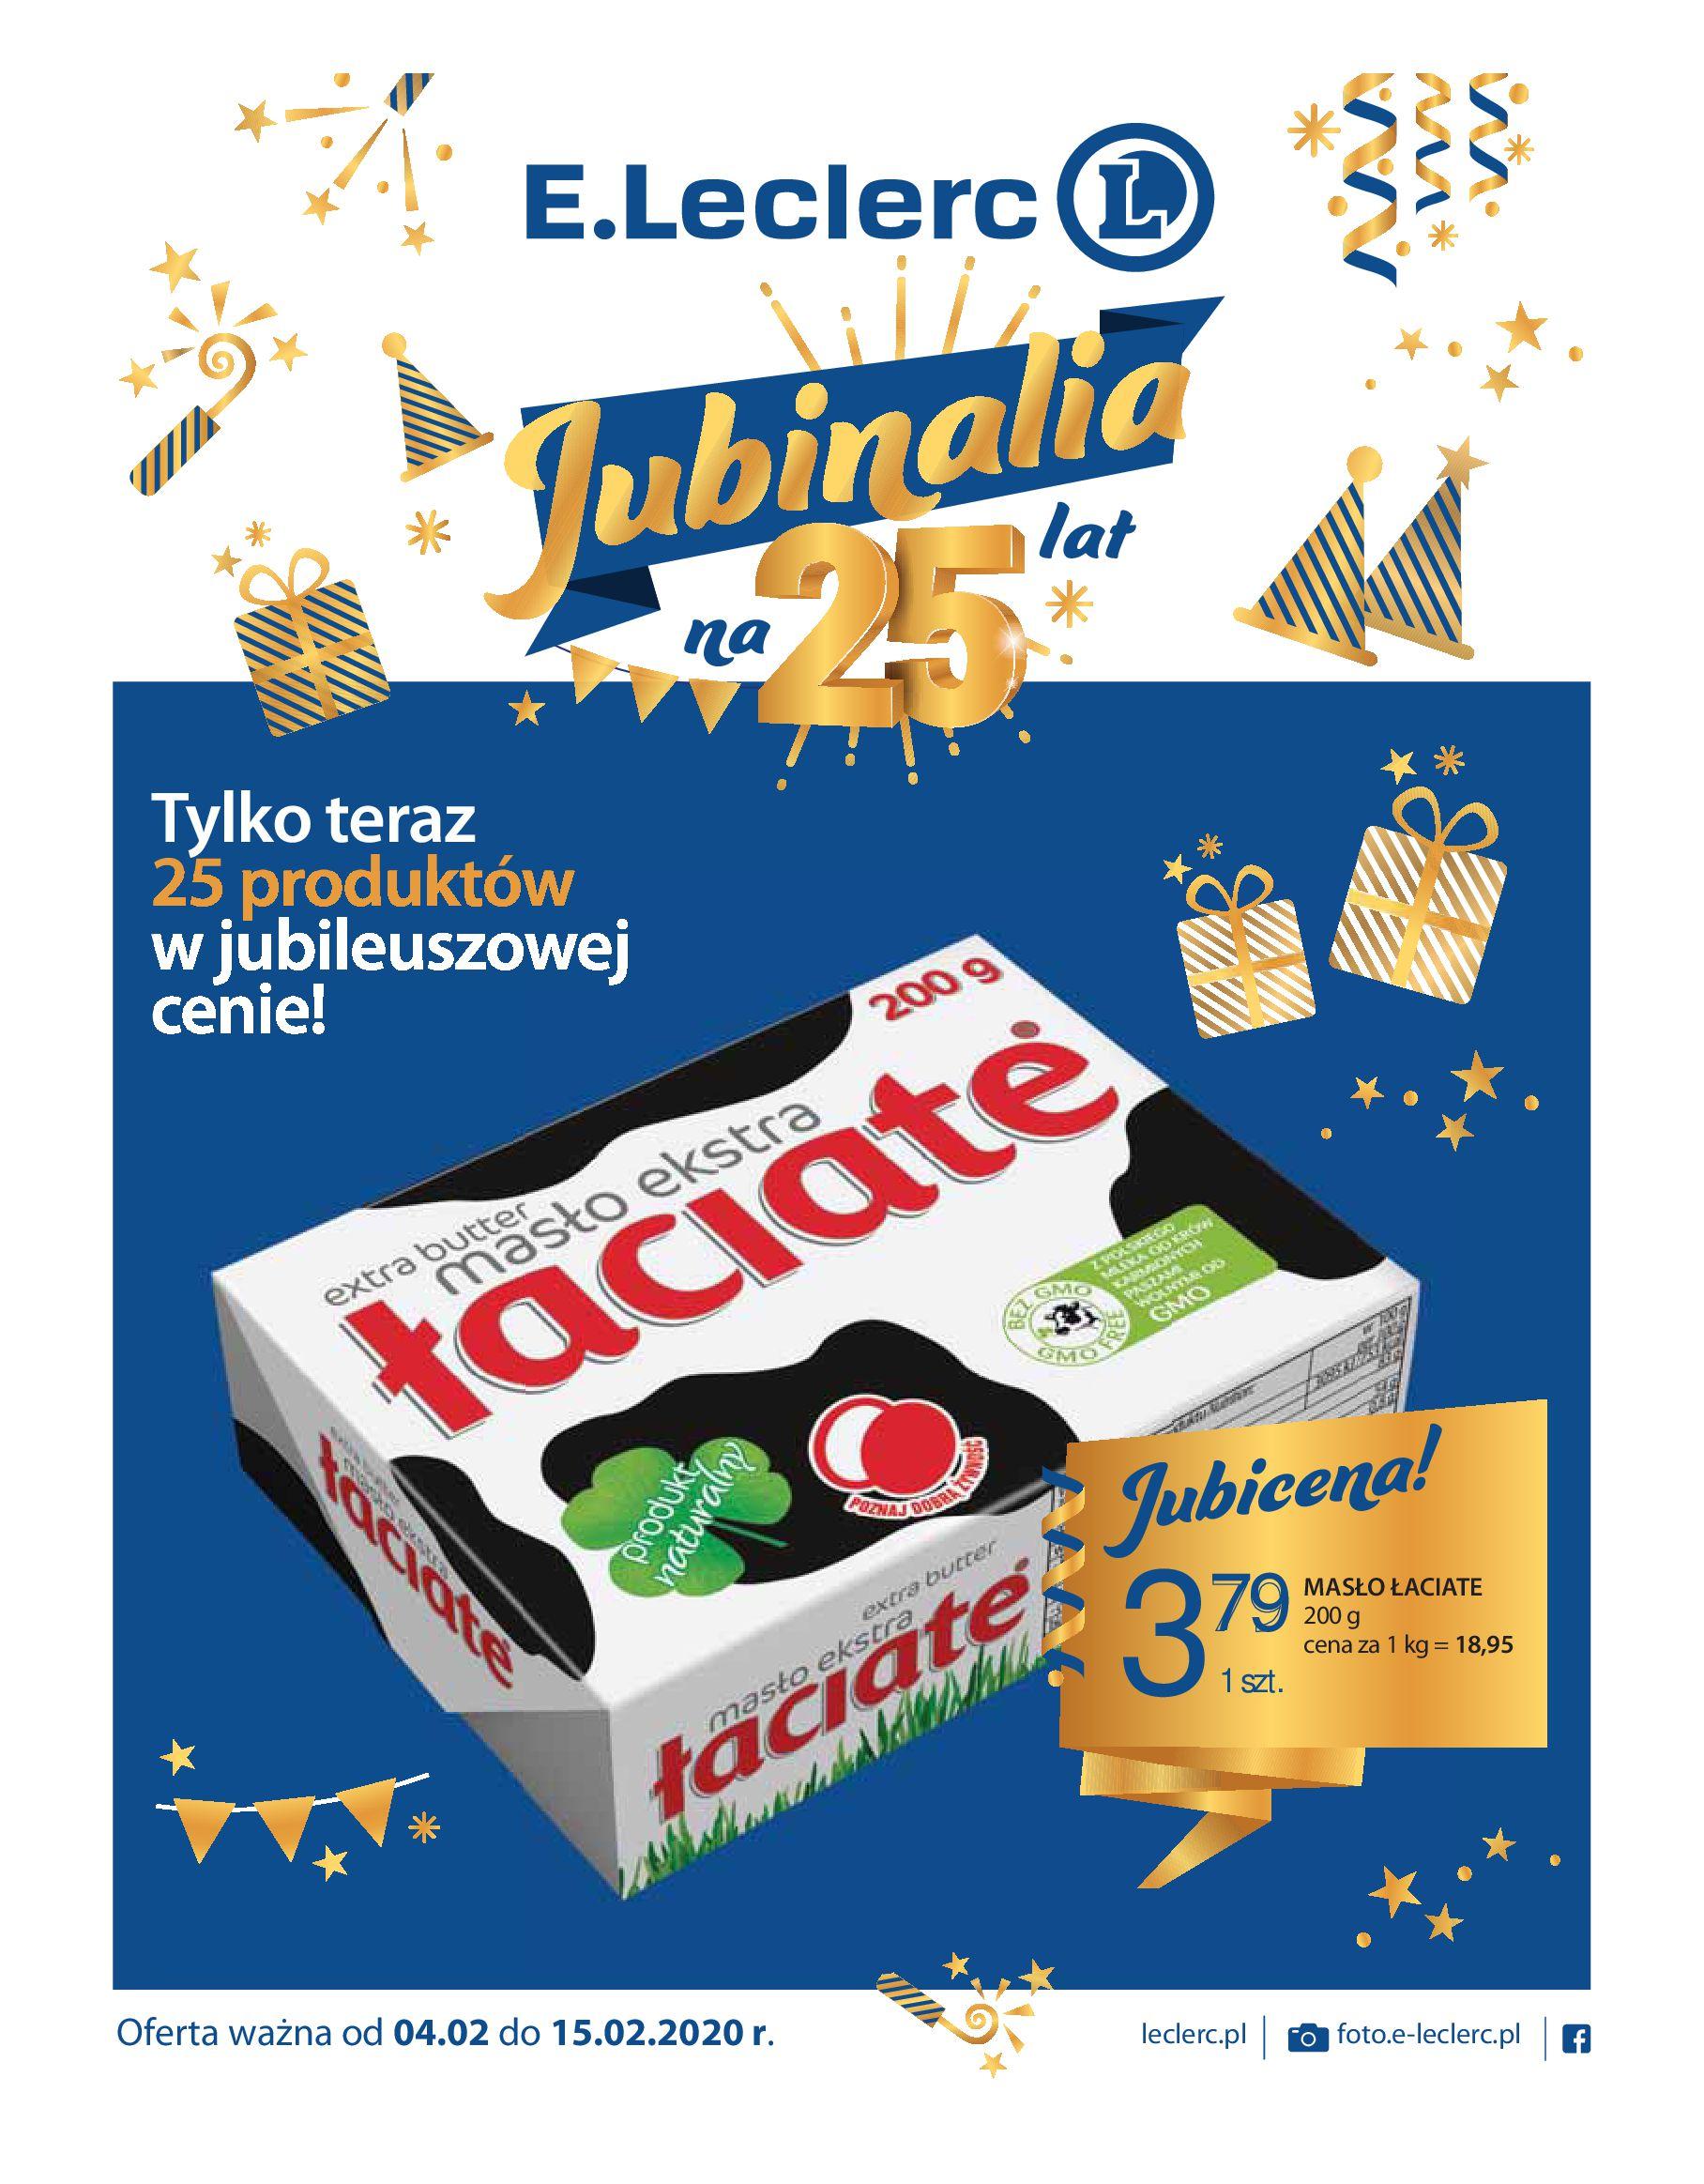 Gazetka E.Leclerc - Oferta promocyjna-03.02.2020-15.02.2020-page-1